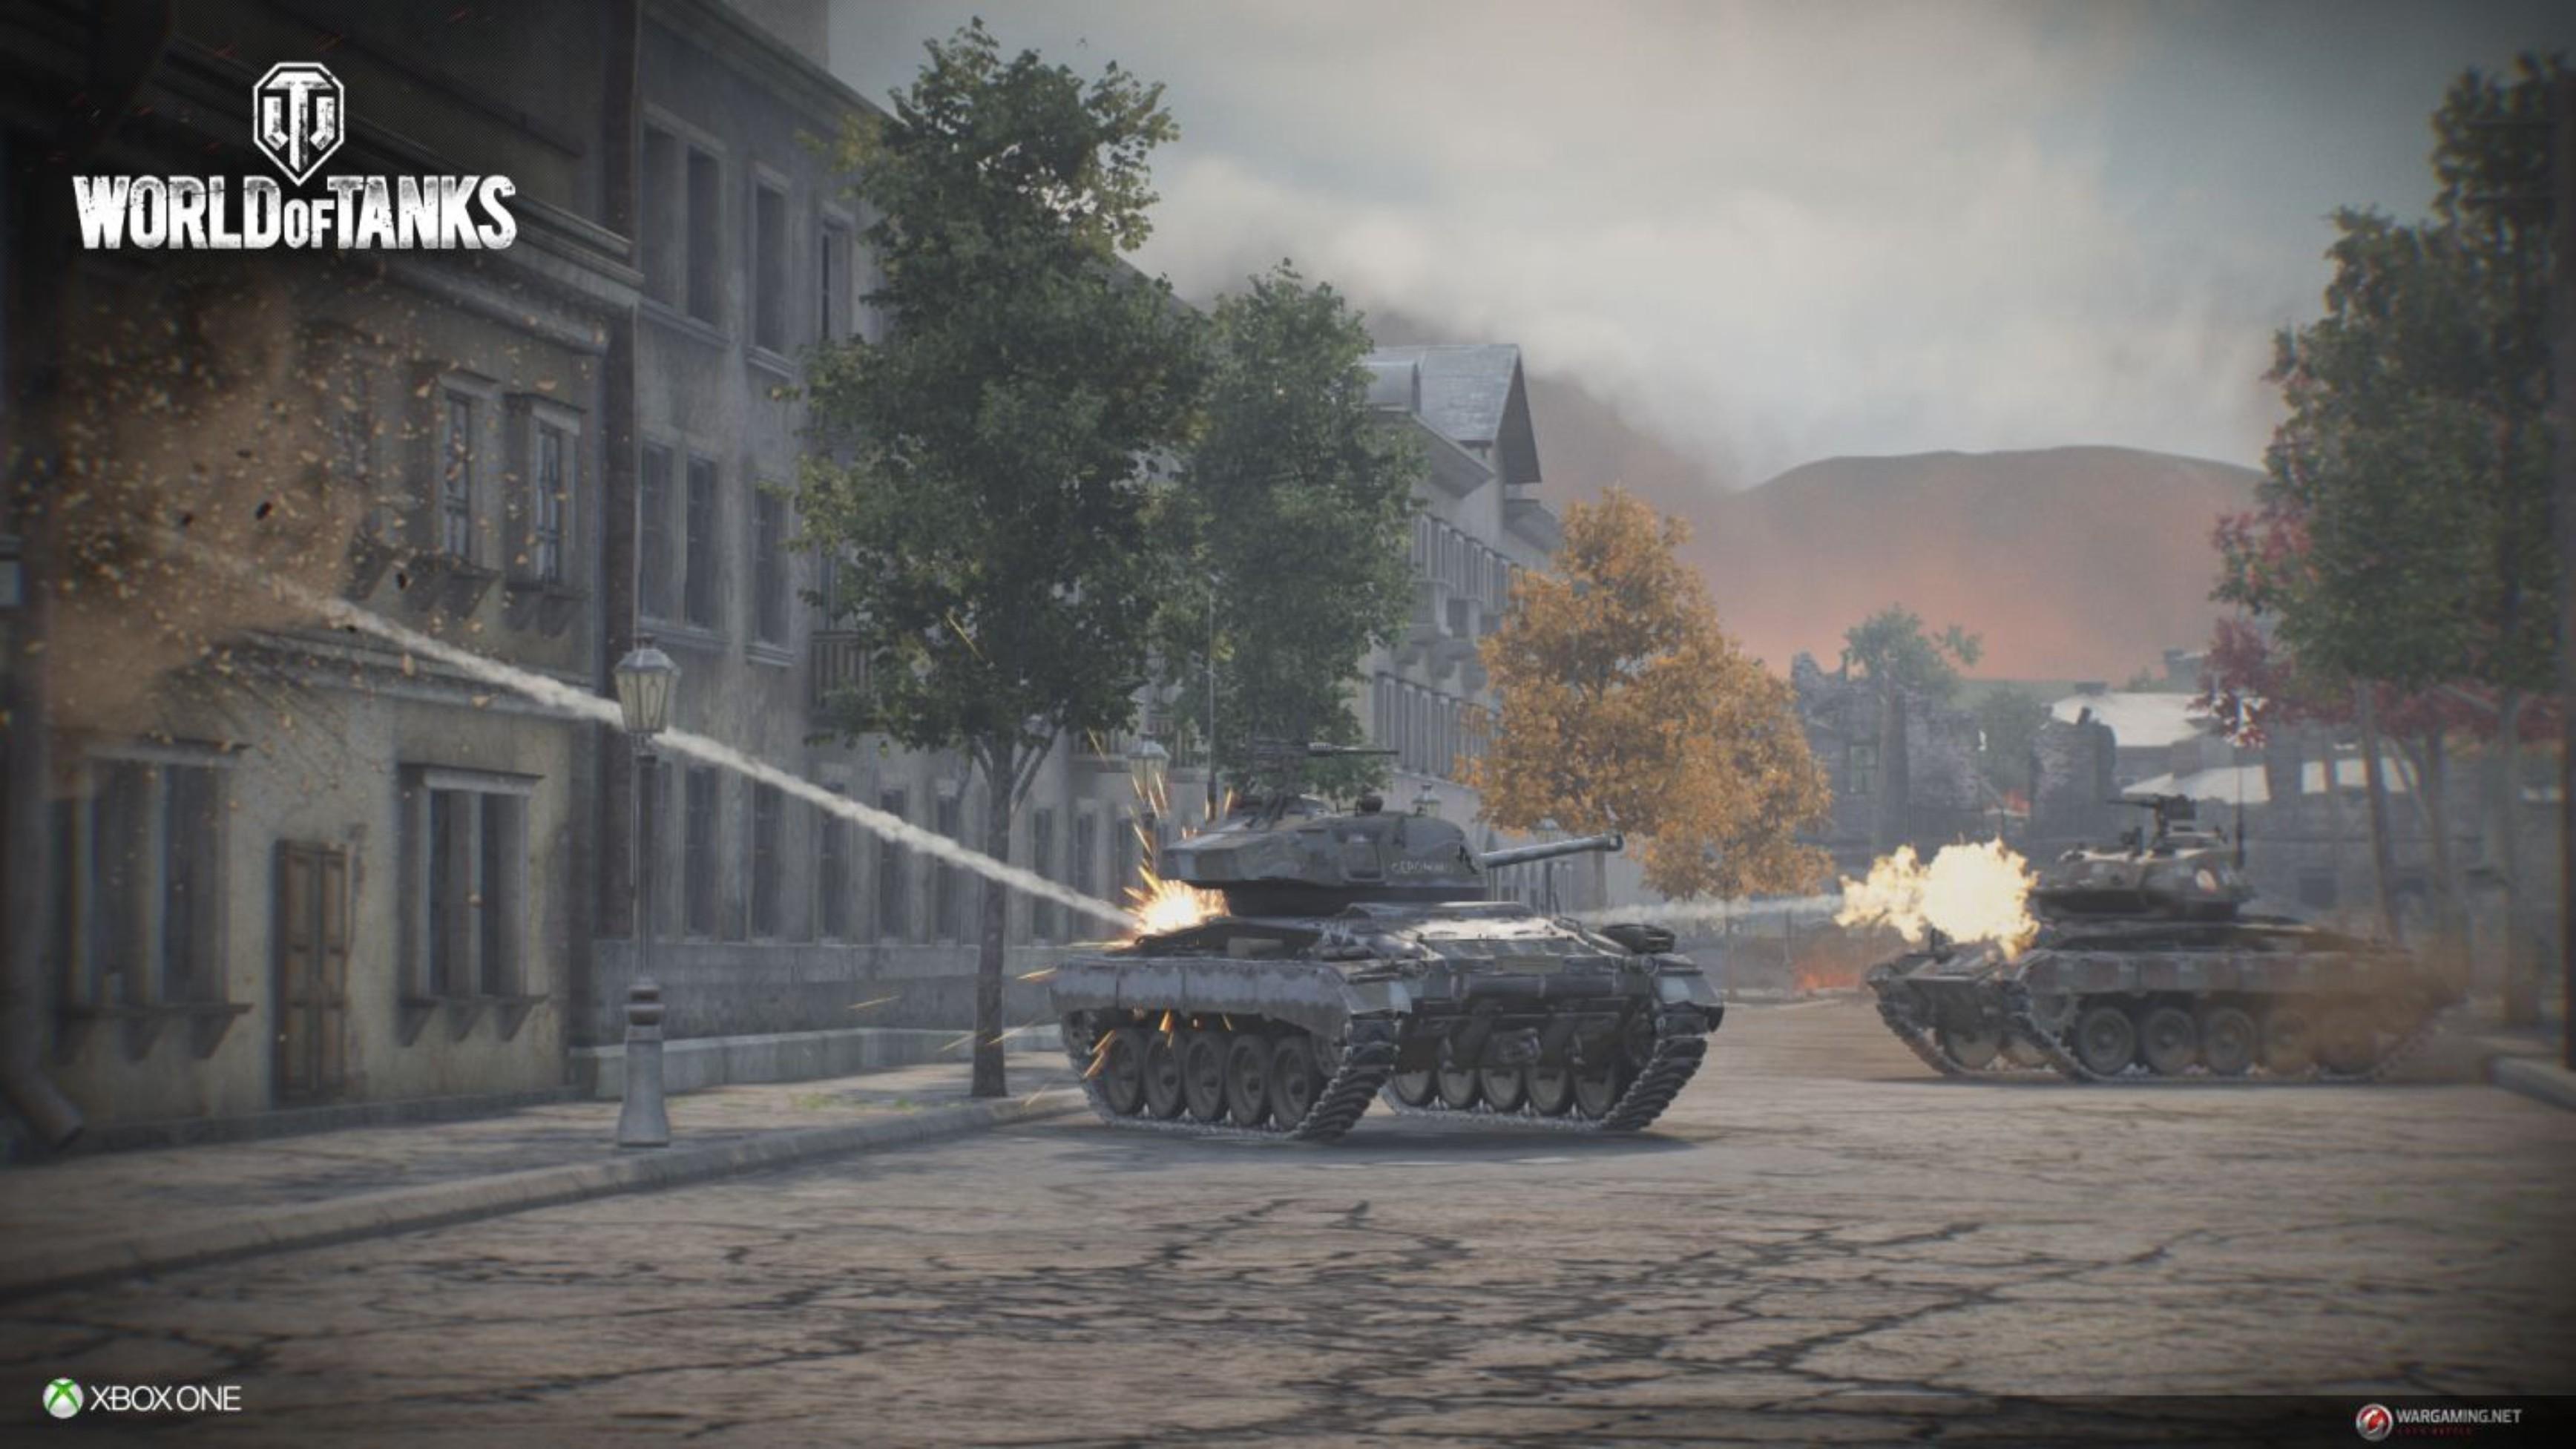 world of tanks mods 9.4 aslain